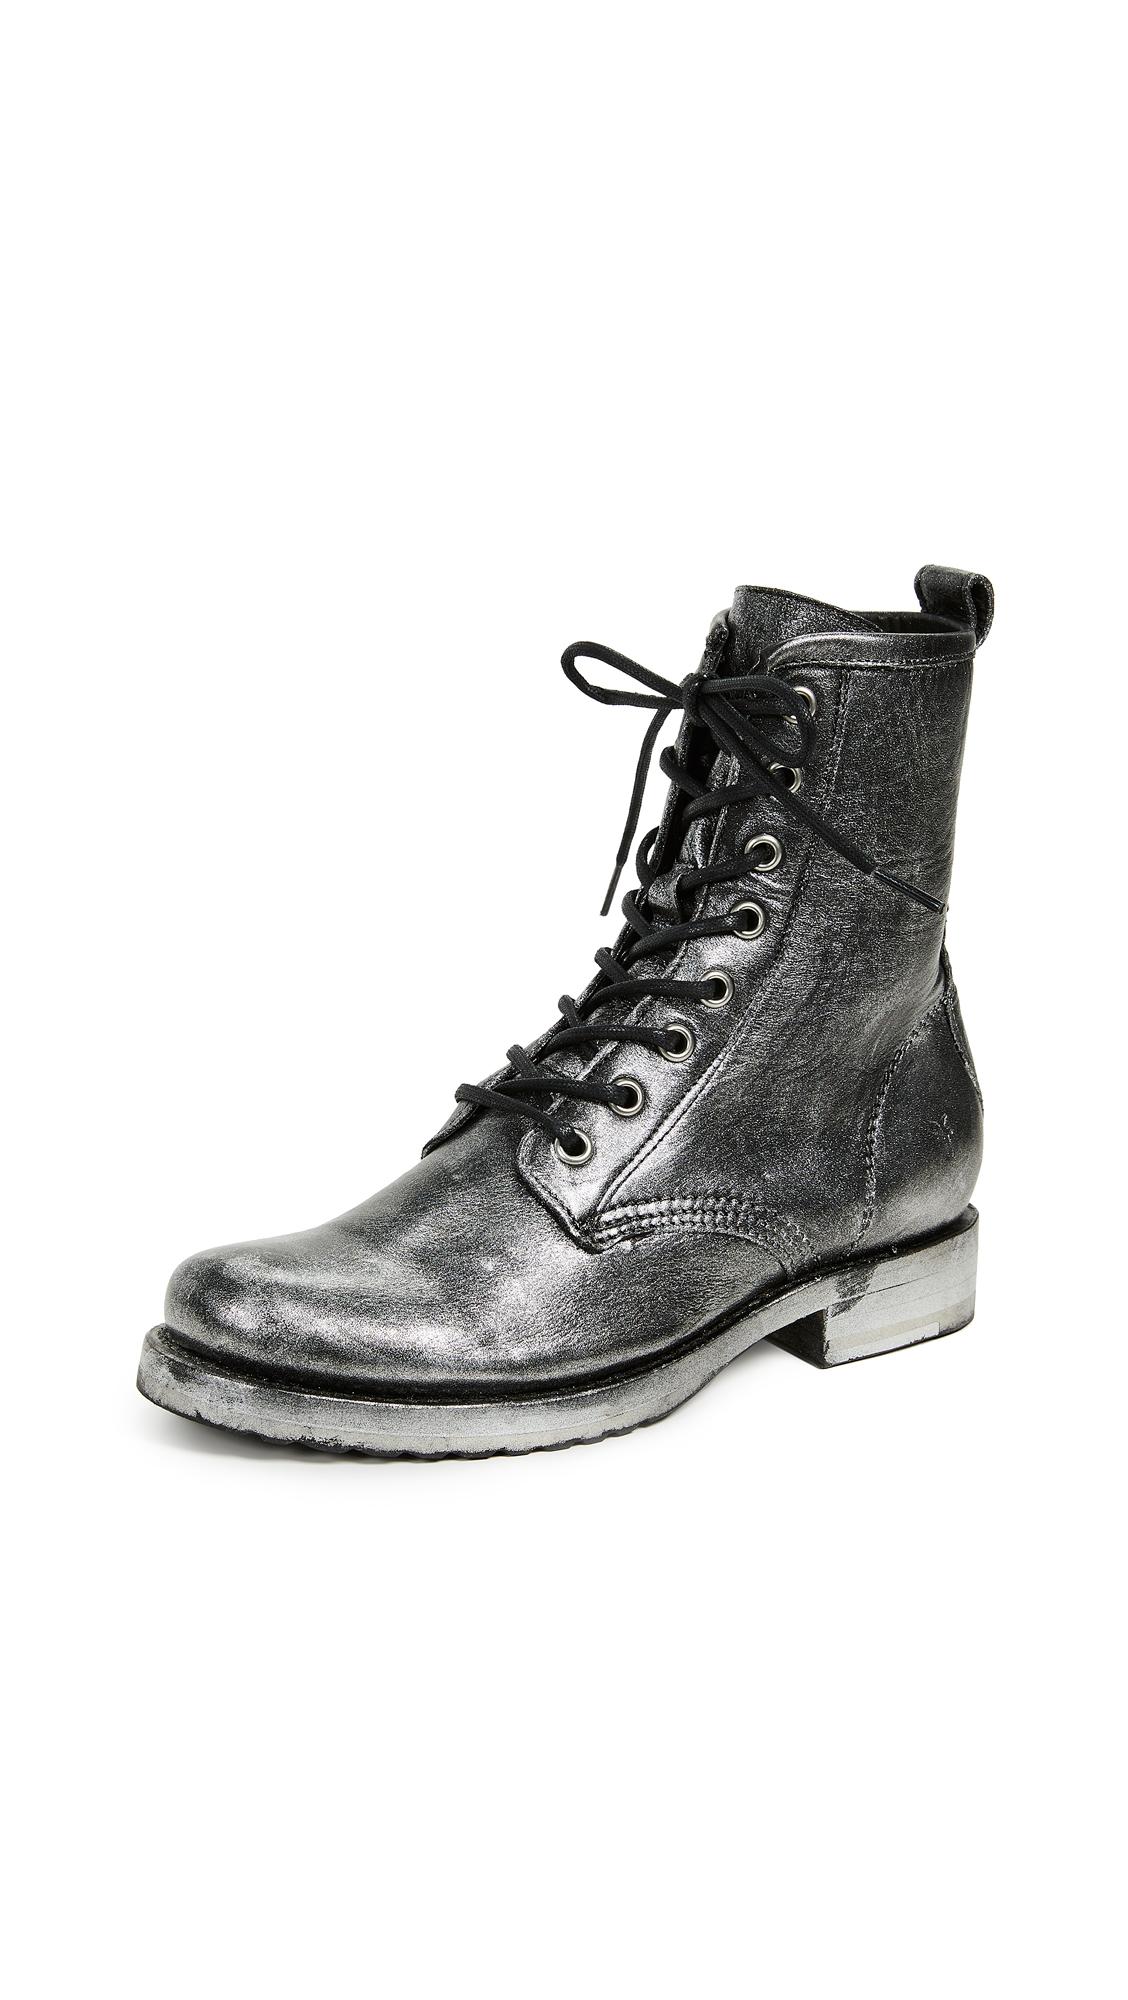 Frye Veronica Combat Boots - Black Multi